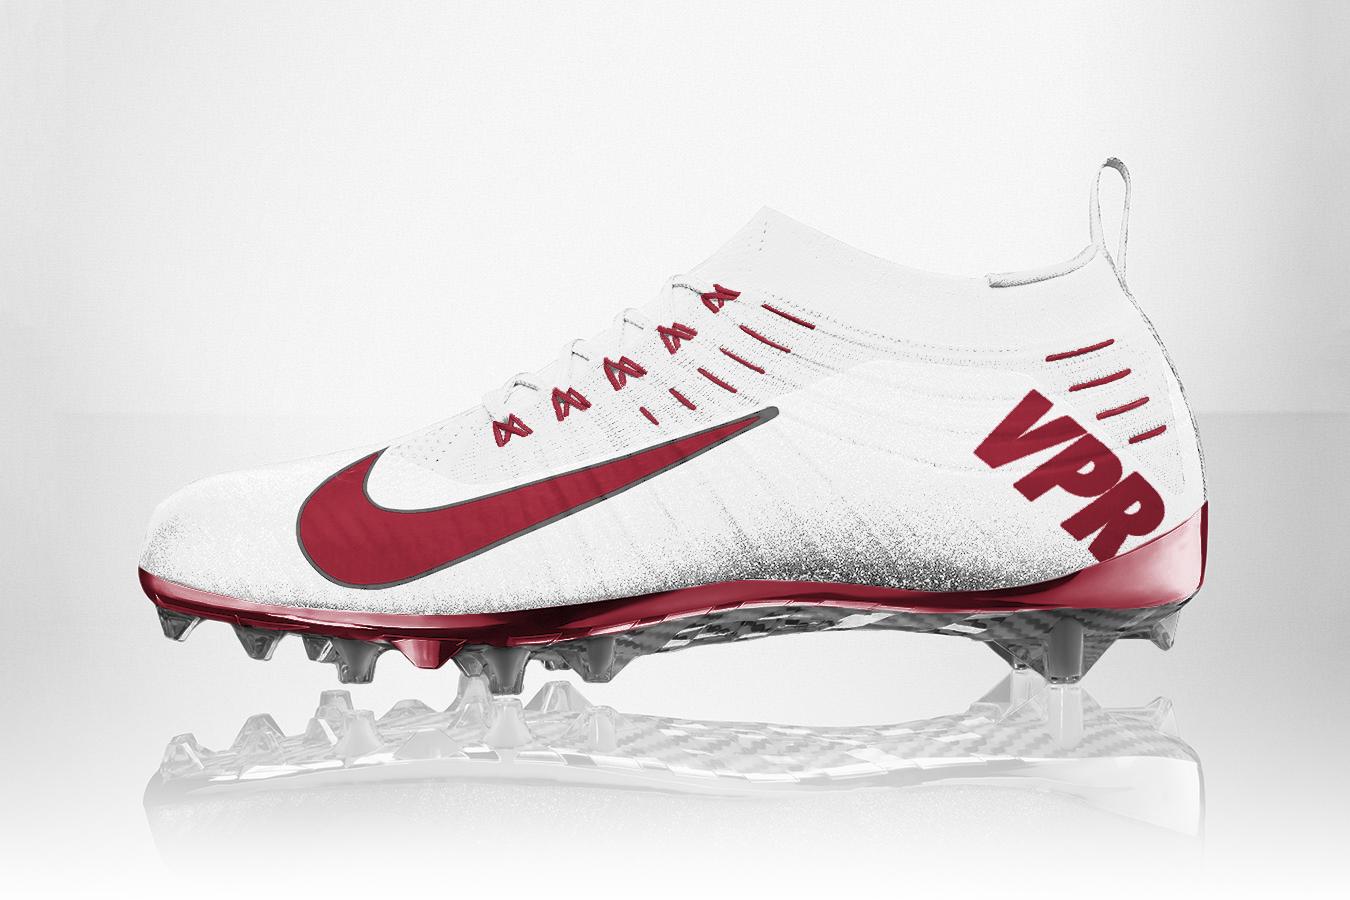 Nike 2020 Football Cleats Cheap Sale